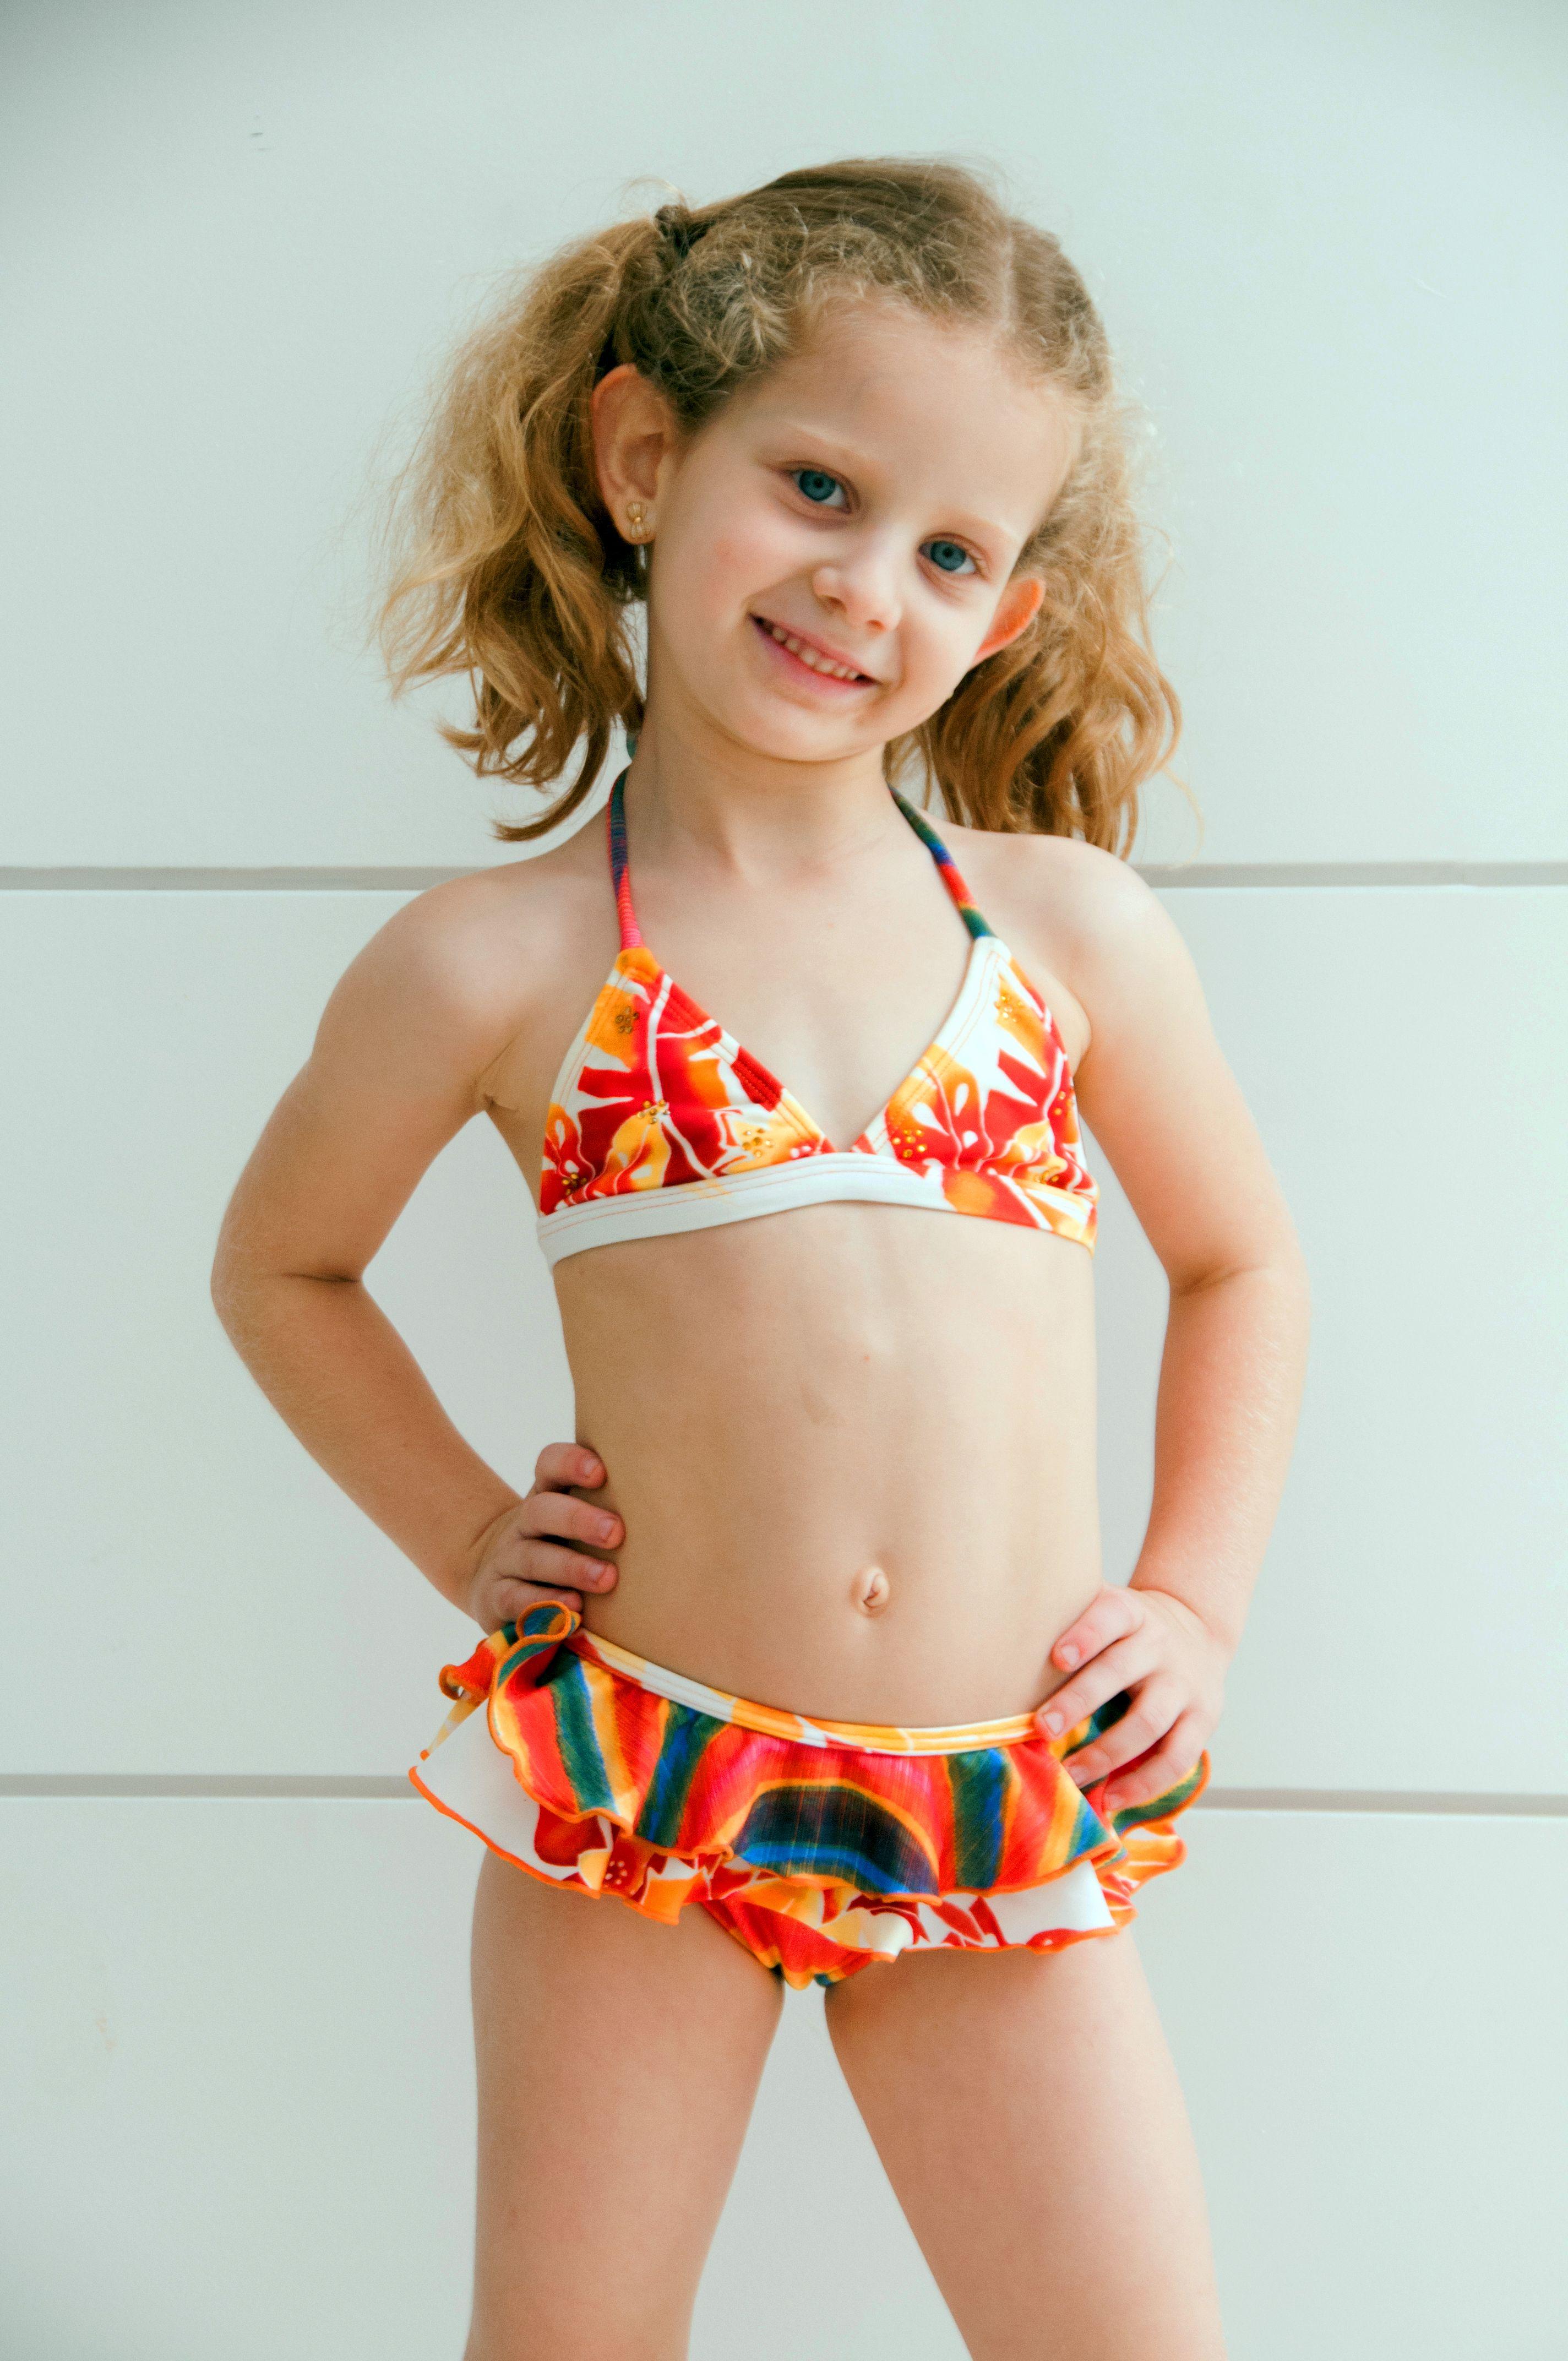 9b97dd0fb1e9e Girls Rainbow bikini - Lemons & Limes Kids Swimwear #kids #girlsbikini